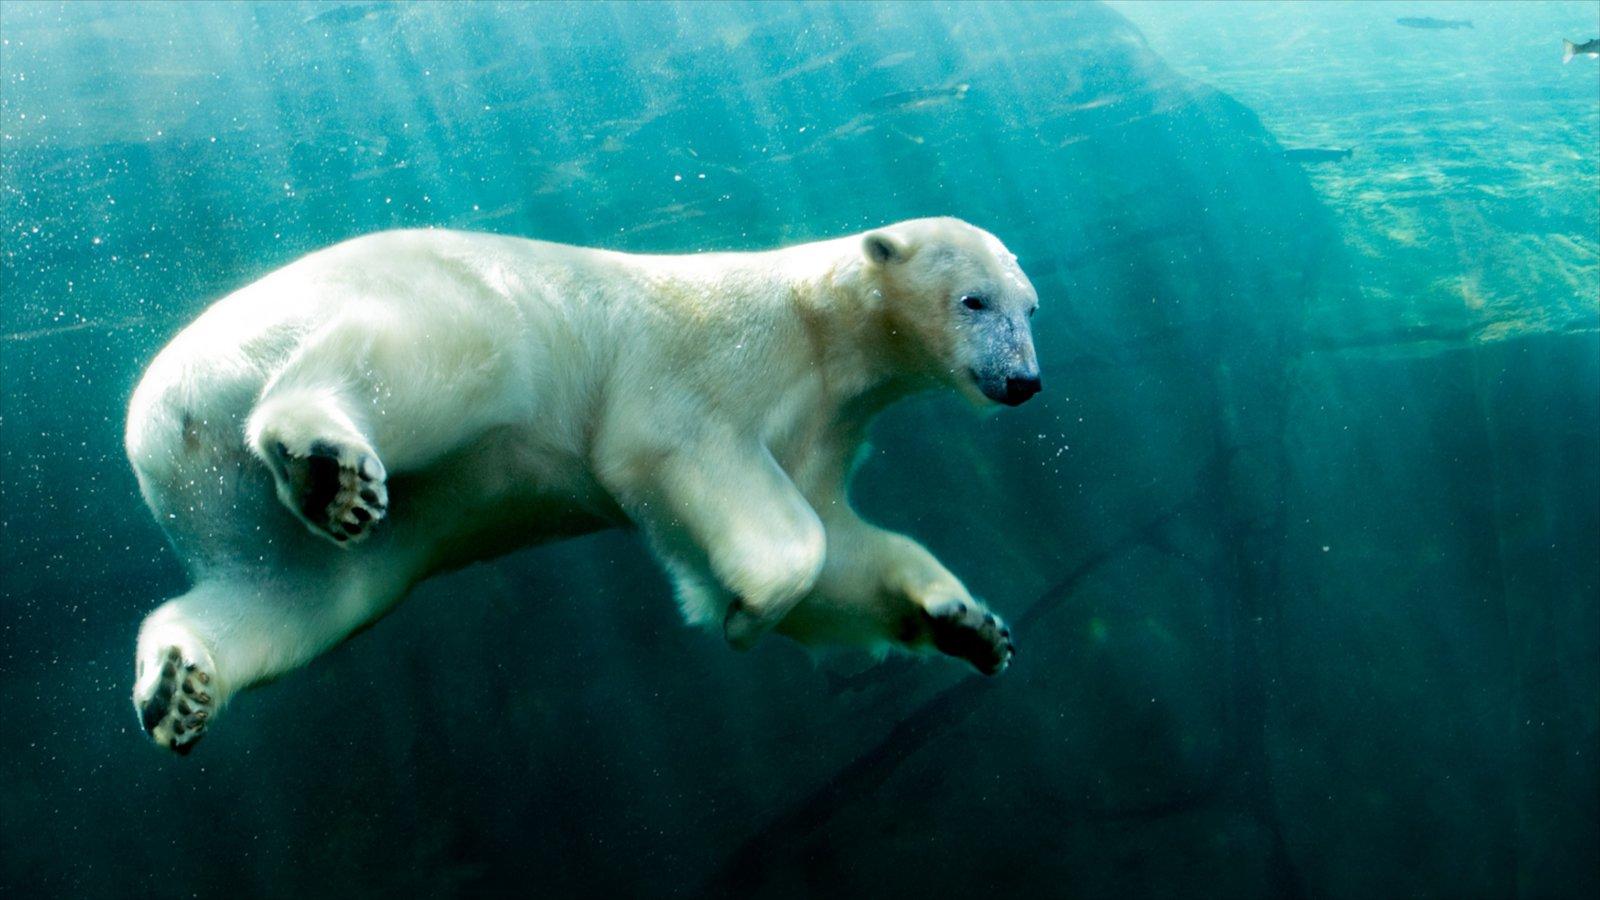 Columbus Zoo and Aquarium mostrando animais terrestres, animais de zoológico e animais perigosos